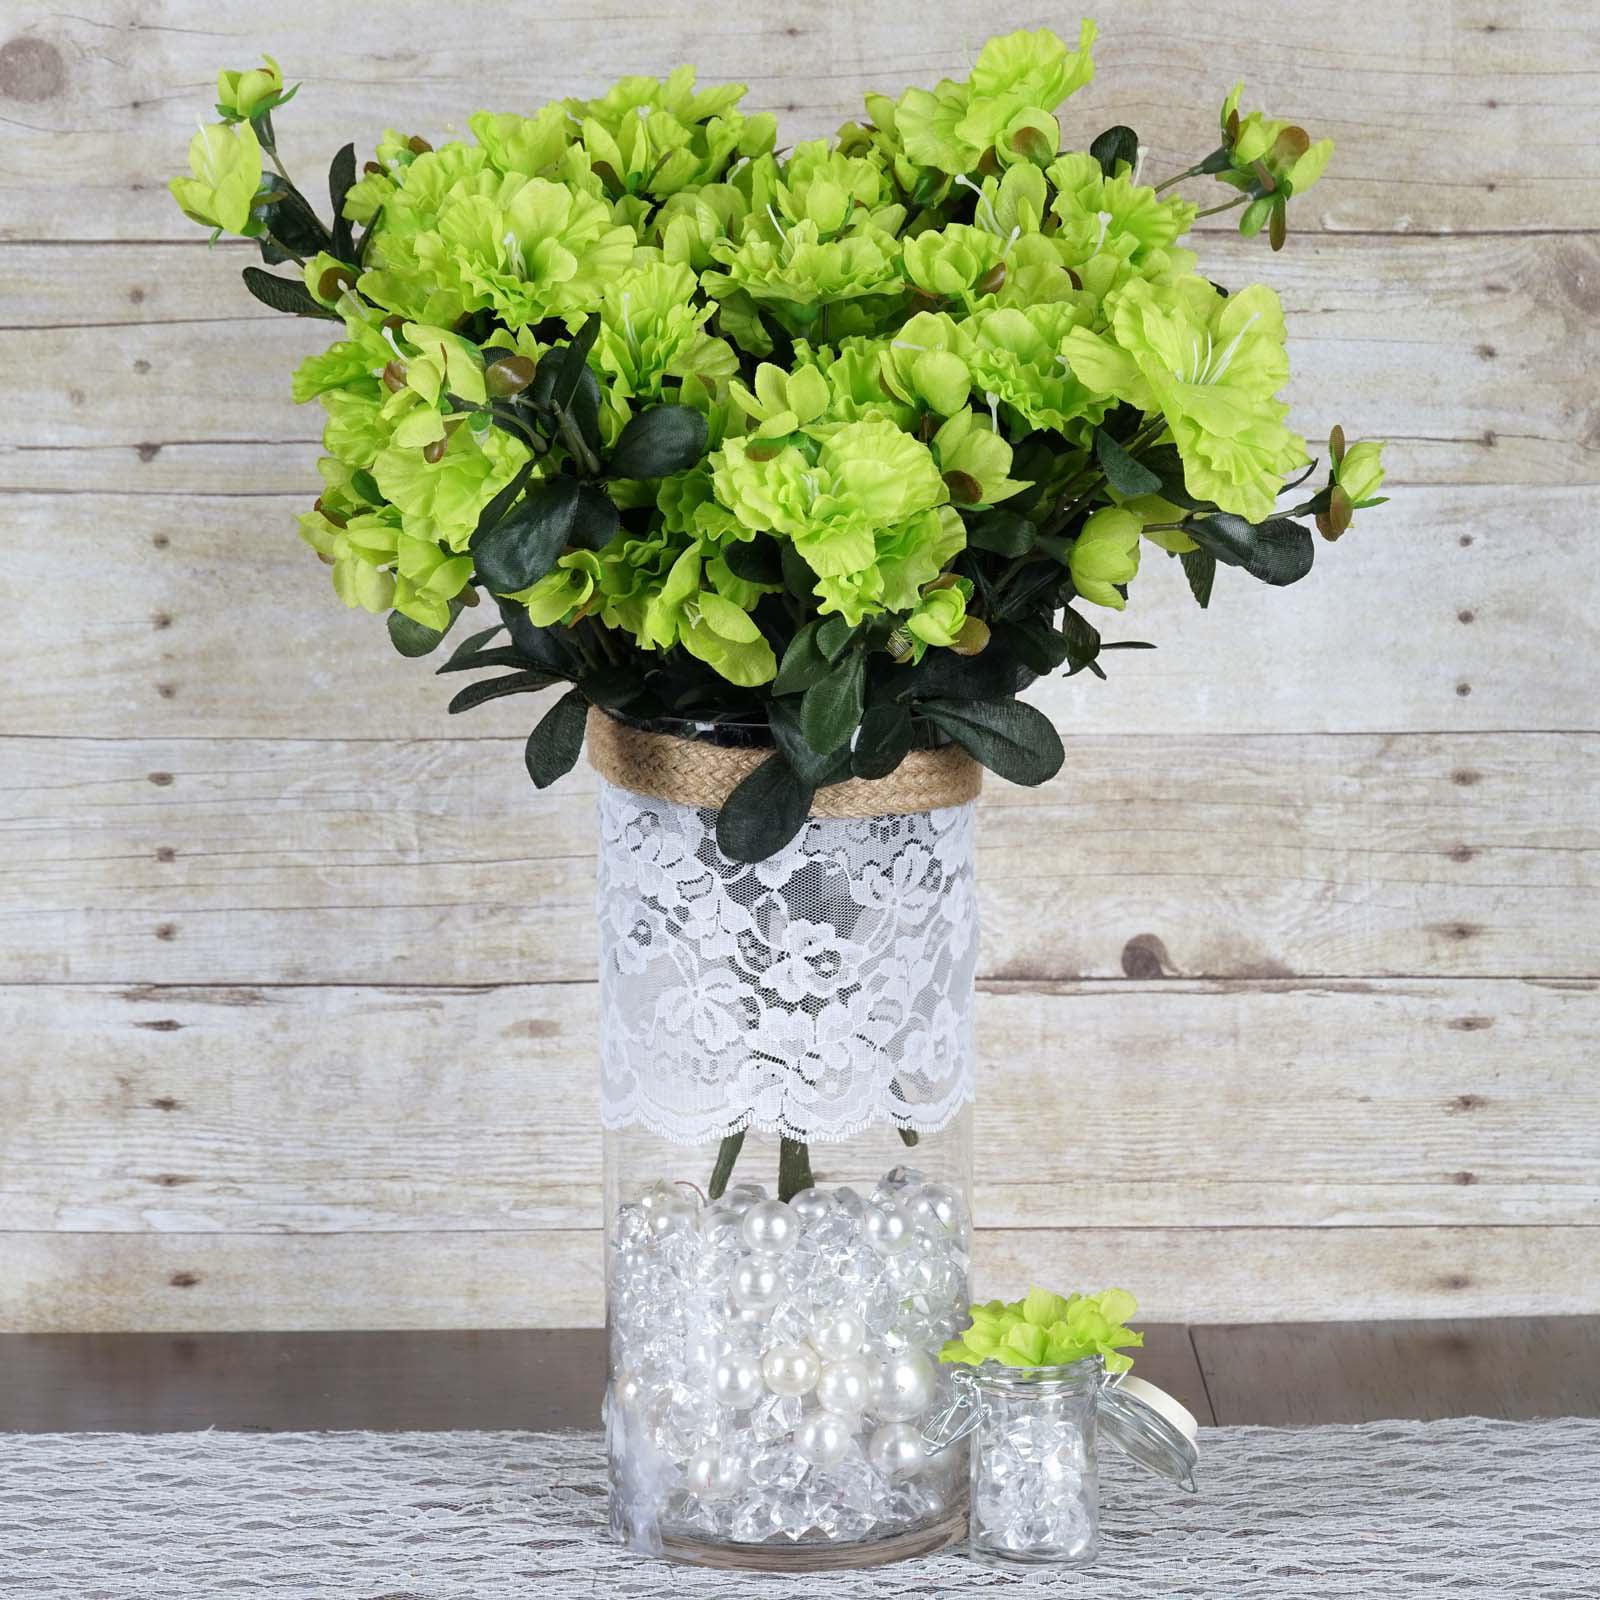 BalsaCircle 120 Silk Gerdenias Flowers for Wedding Party Centerpieces